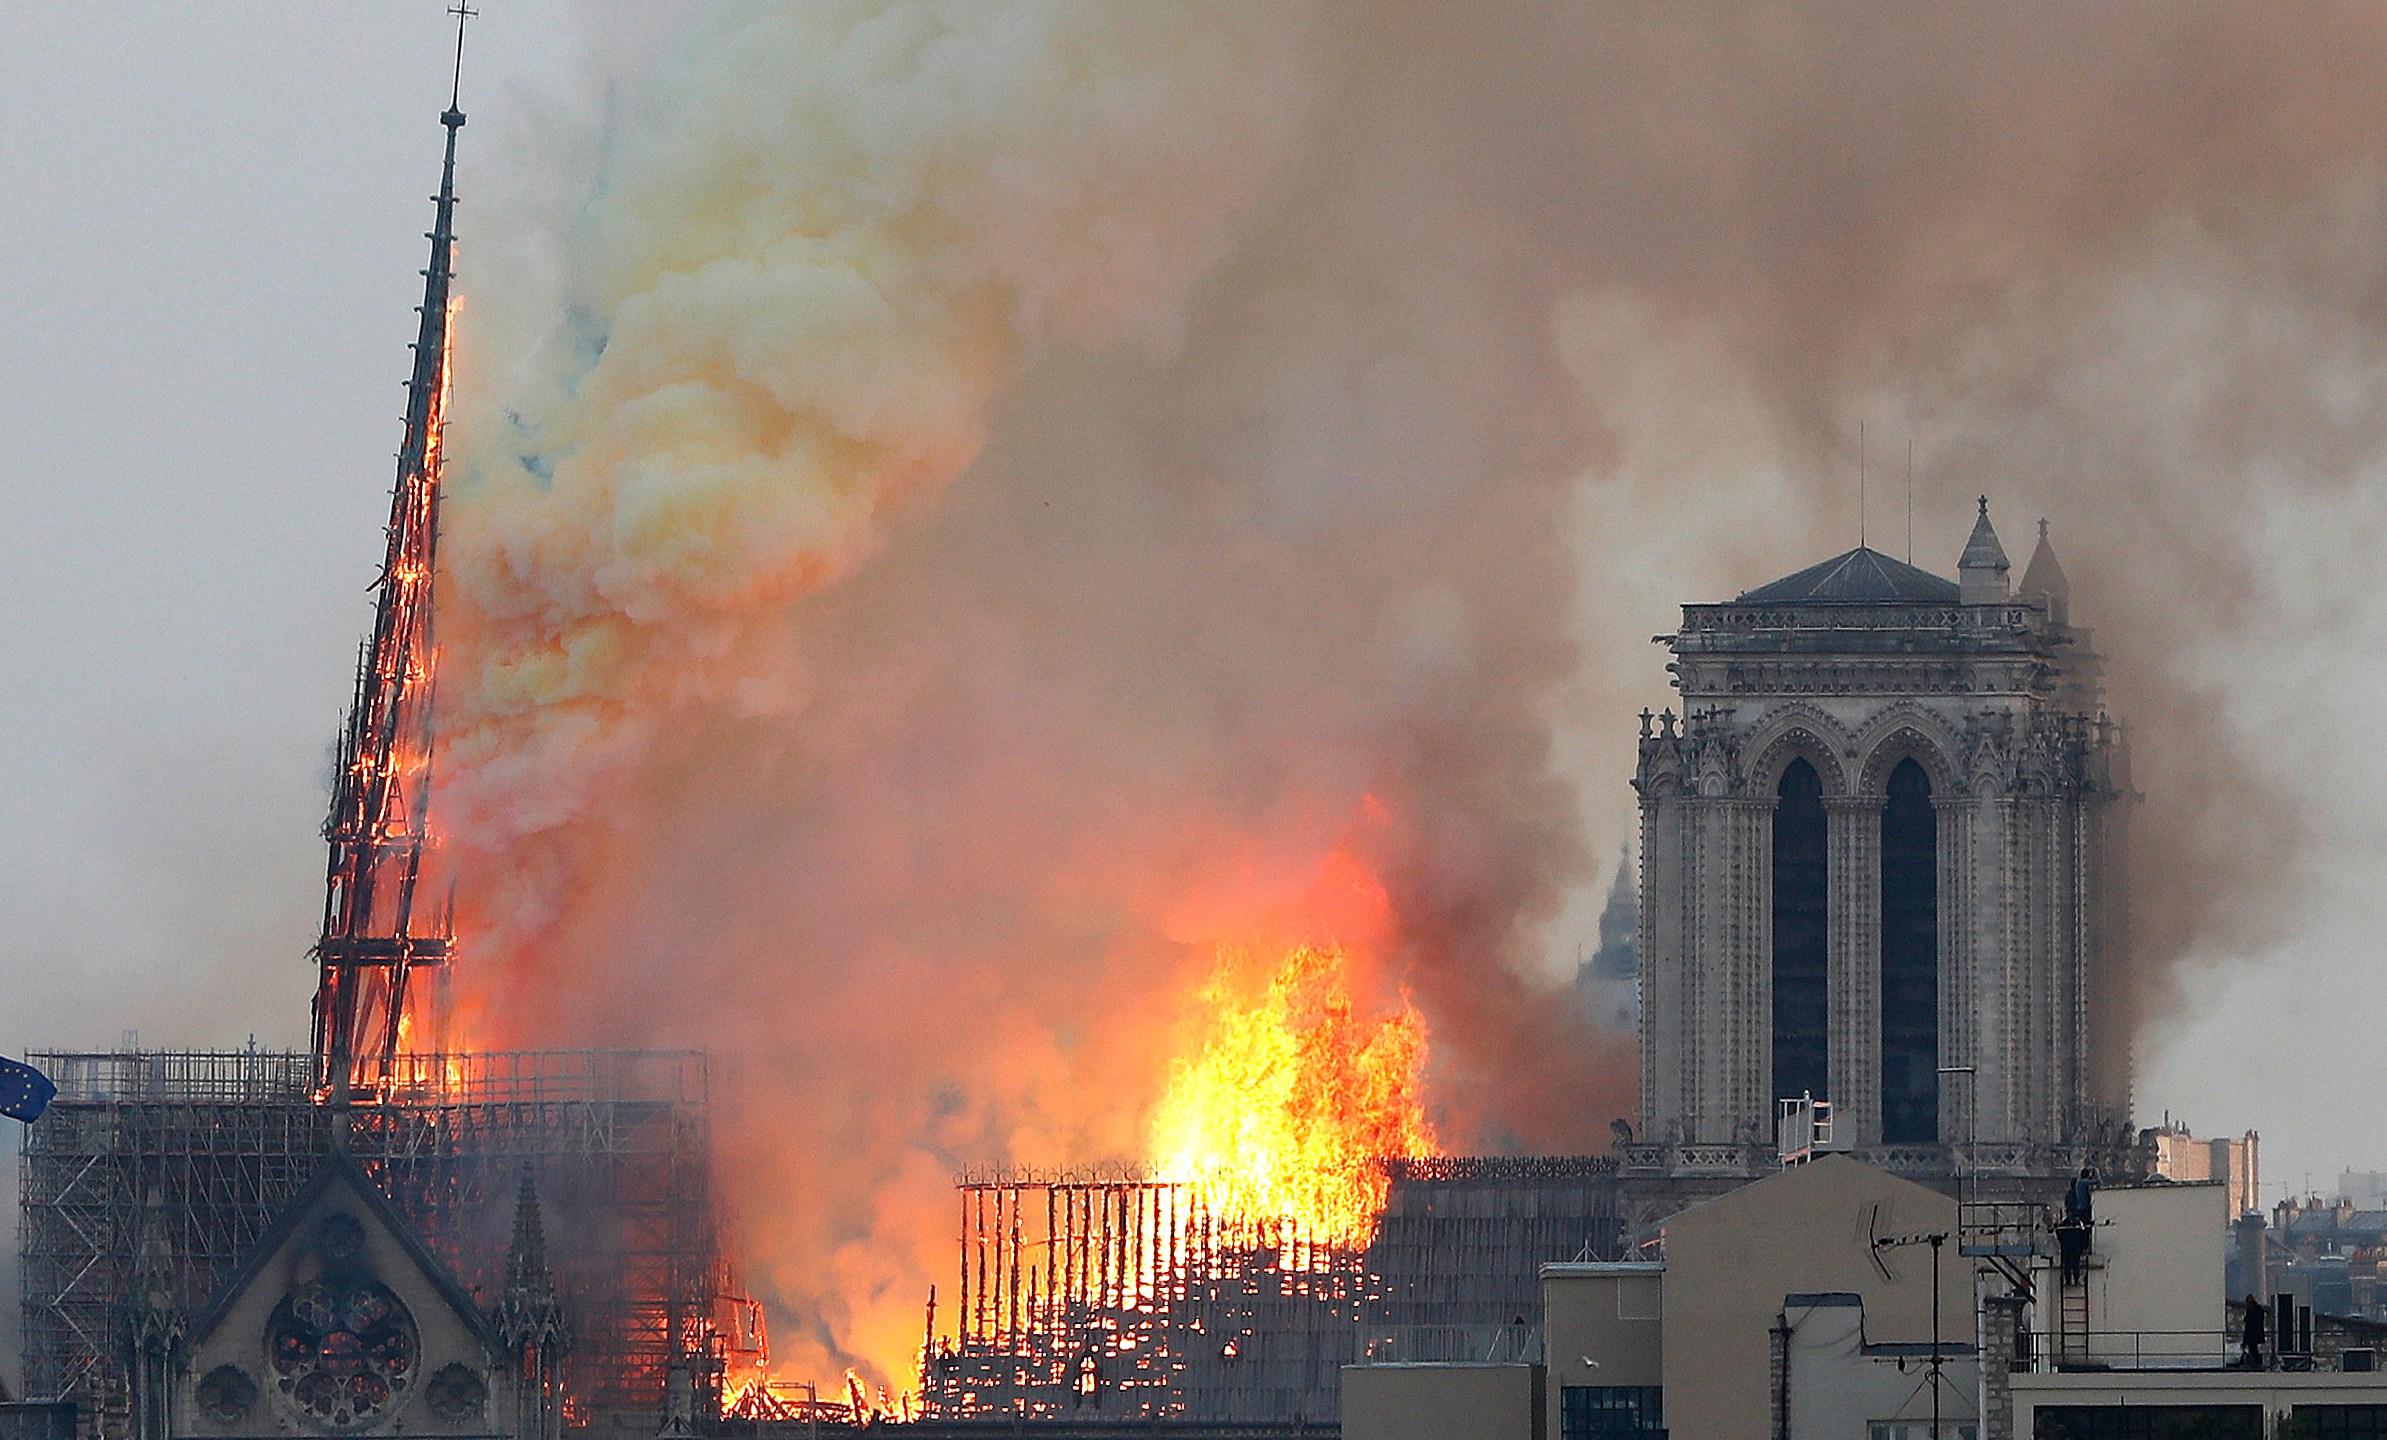 APTOPIX_France_Notre_Dame_Fire_71908-159532.jpg42482137